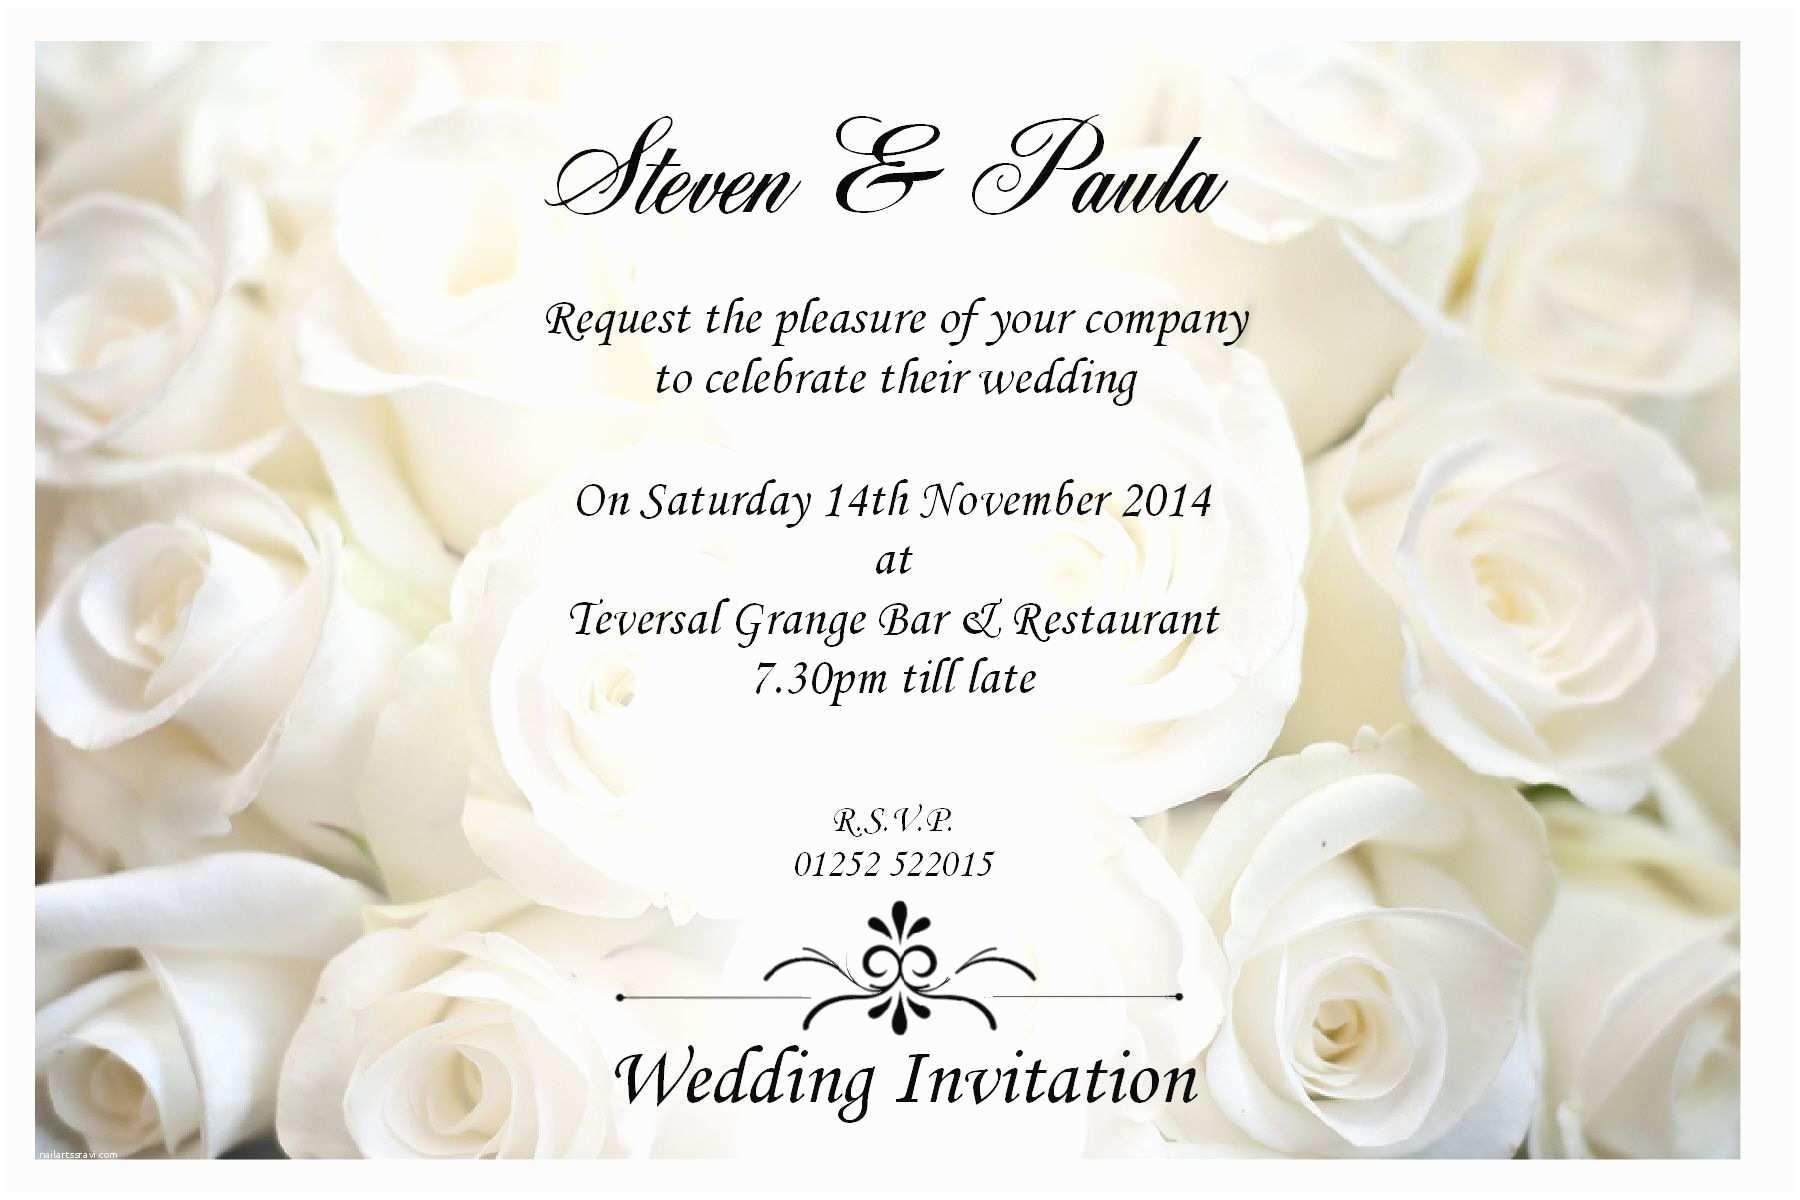 Wedding Card Invitation Wedding Invitation Card Design software Free Elengat Black